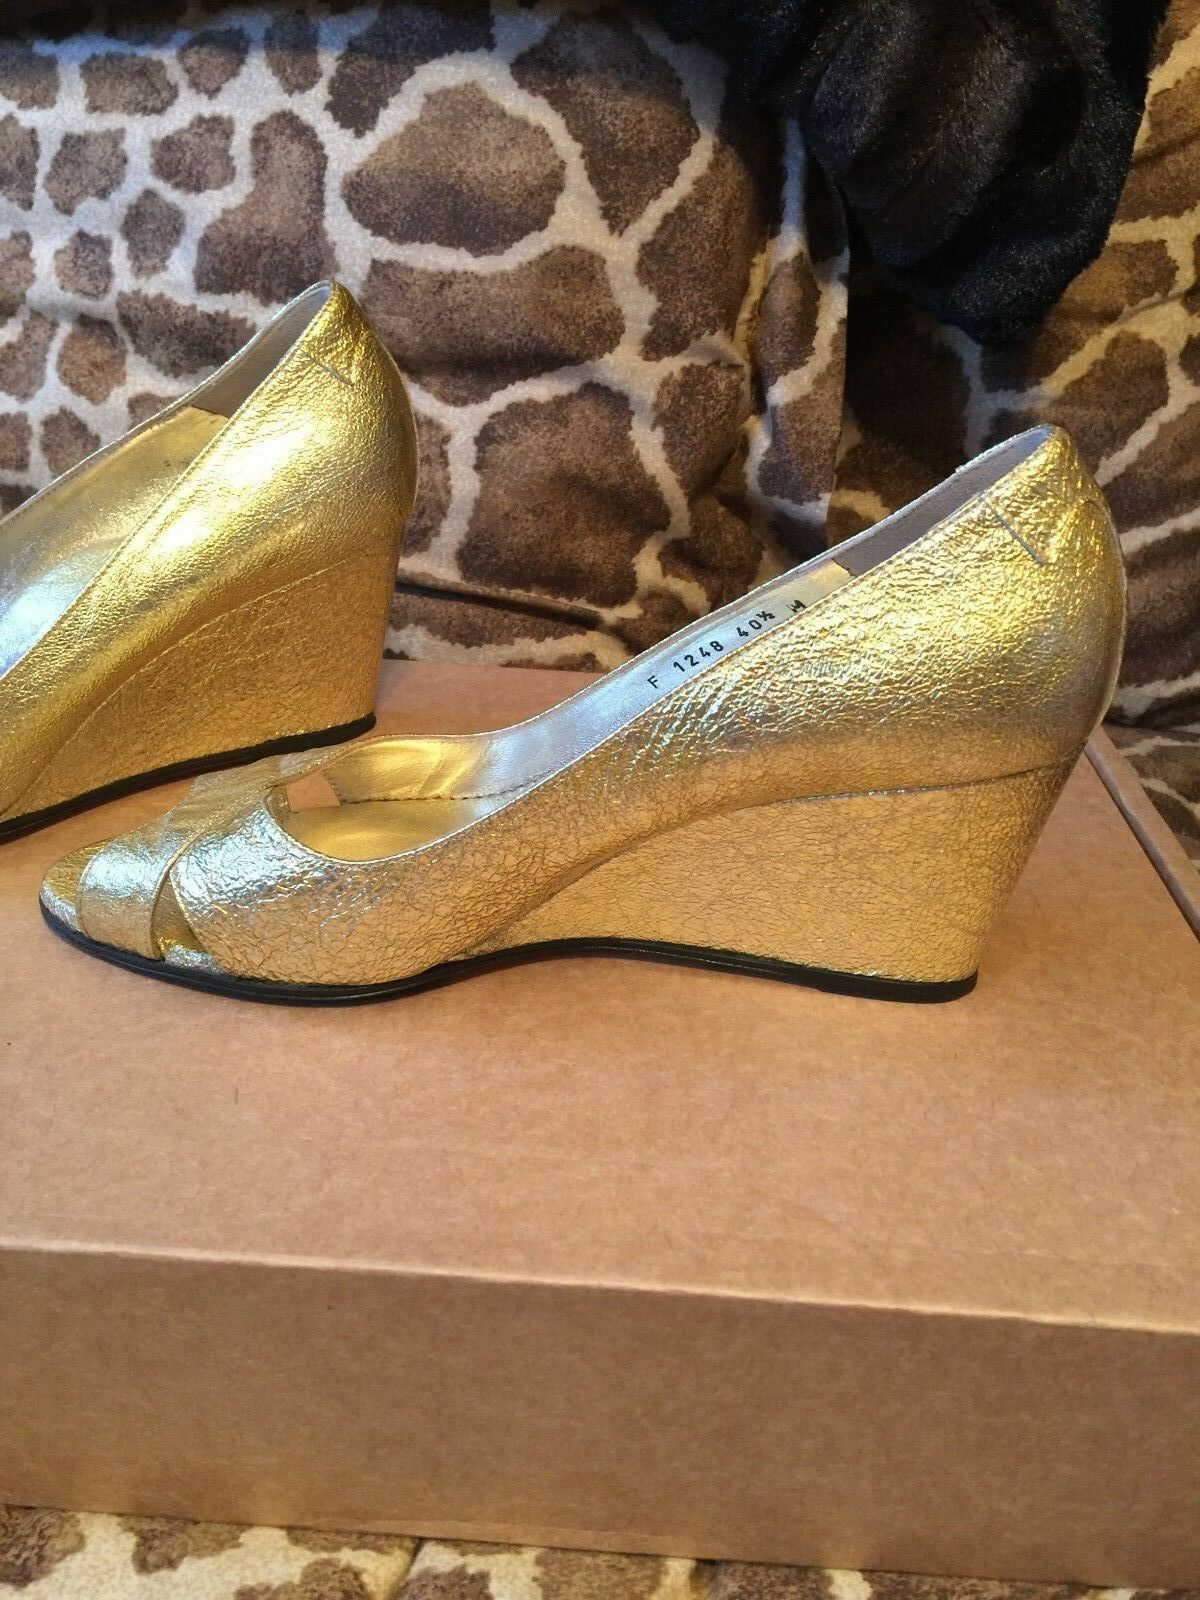 TARYN Rosa Bright Gold Crinkled Leather Open Toe Toe Toe Wedges Heels Pumps schuhe 40.5 114077